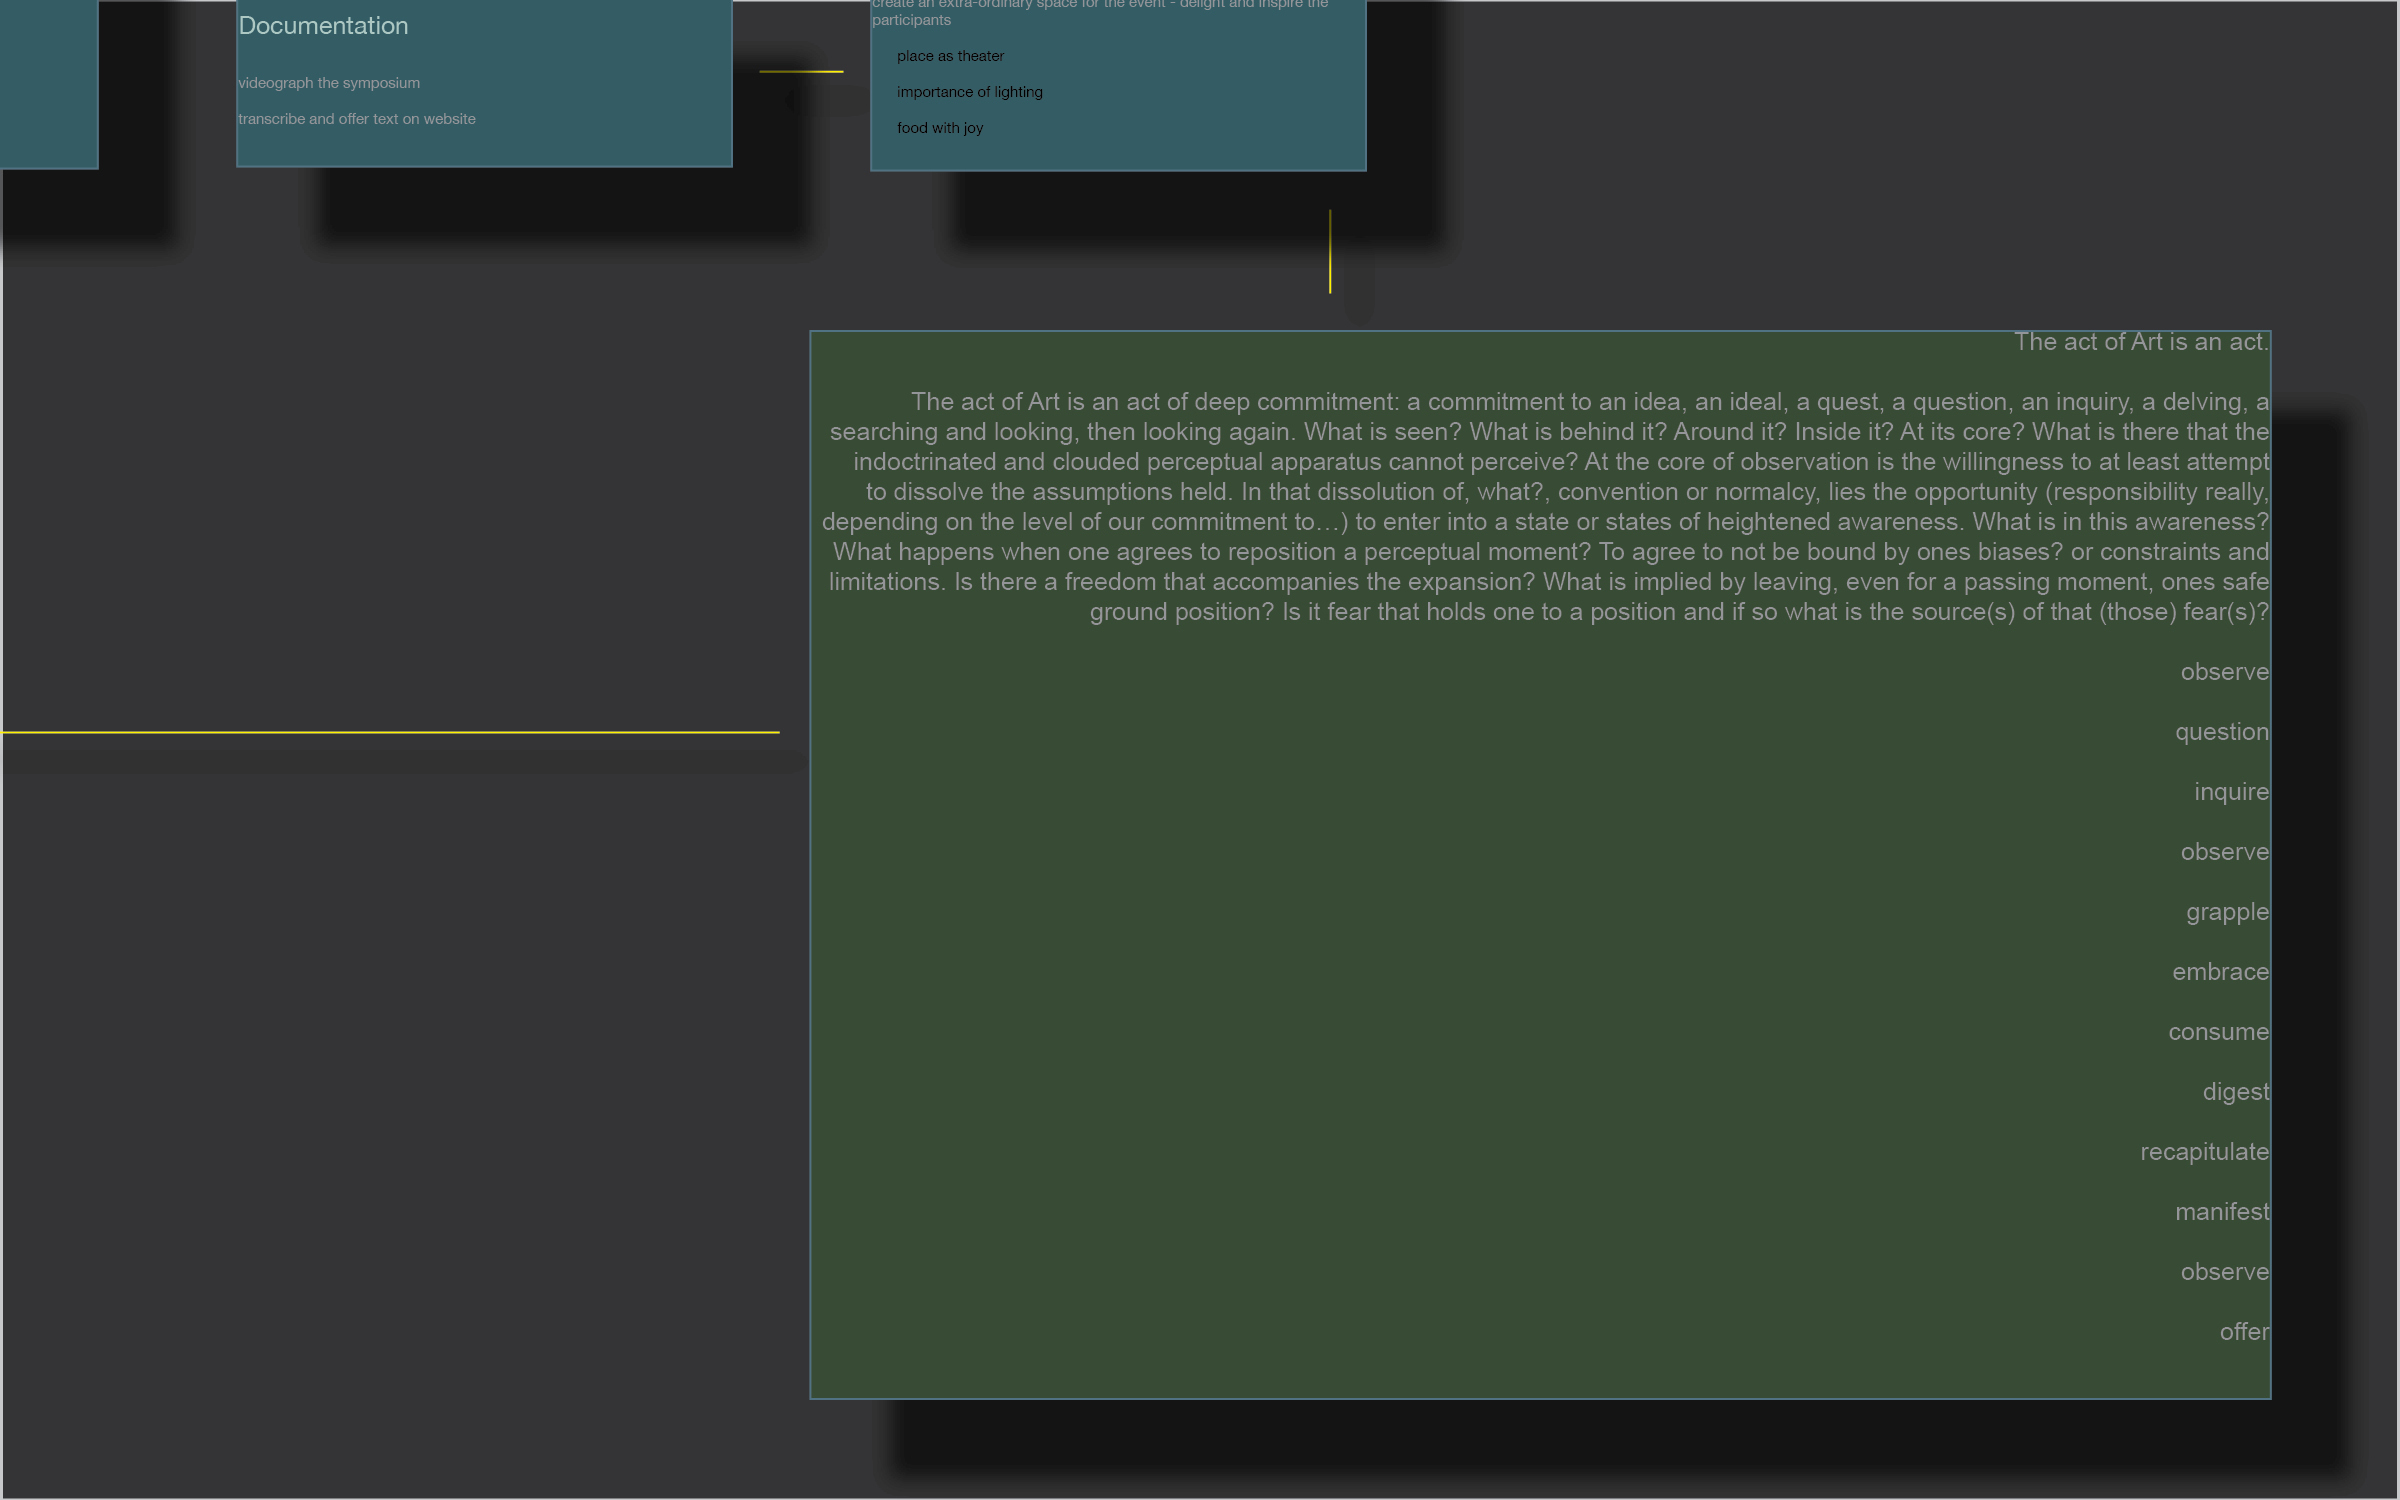 flowchart_sections_final_grey_gradient_single_page2.jpg